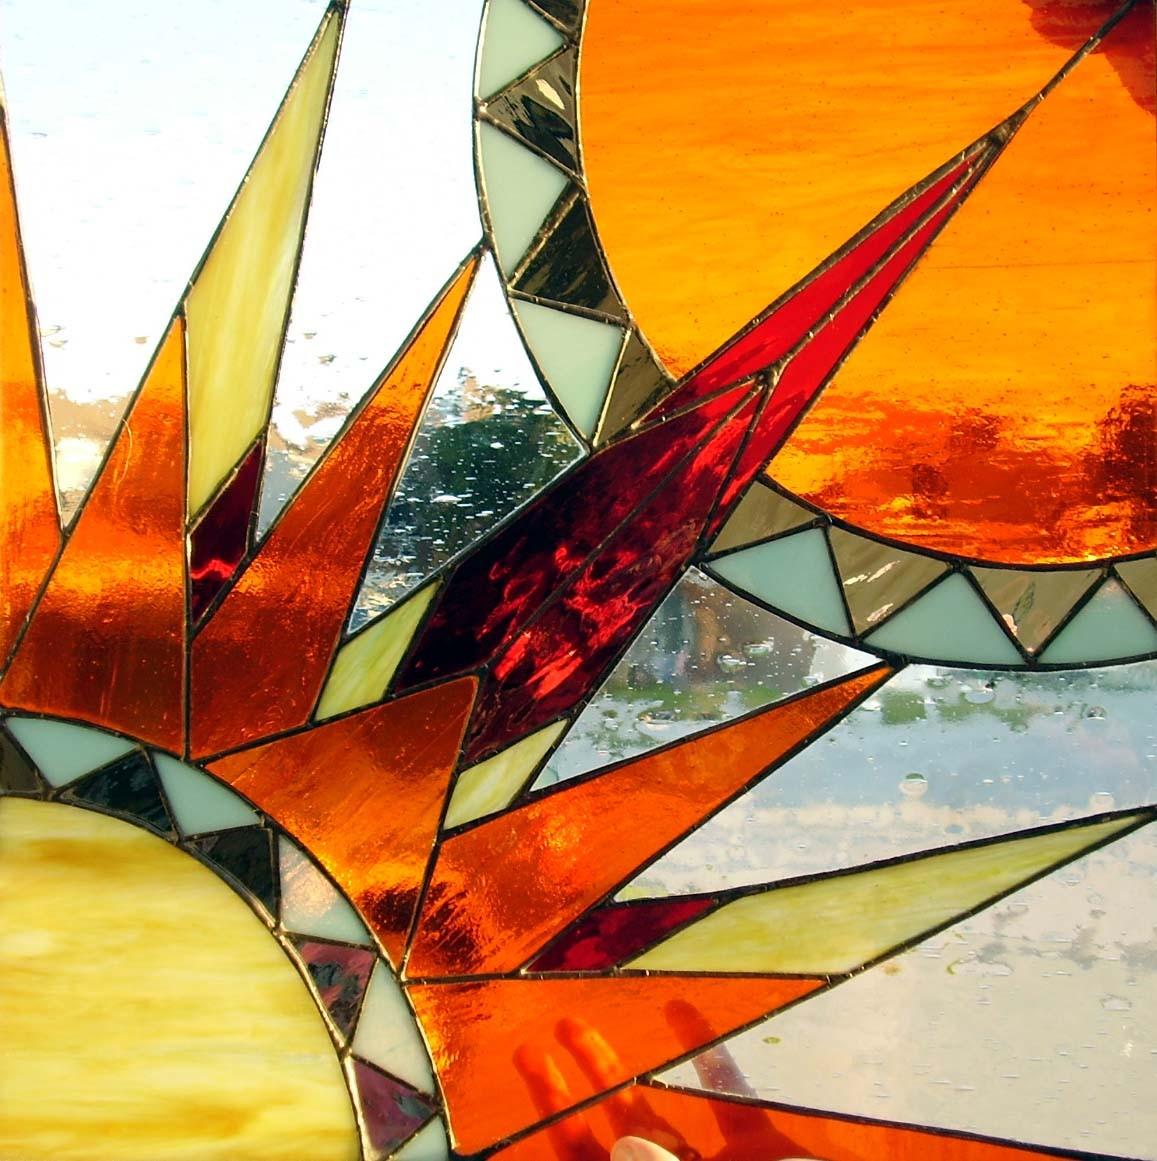 Stained Glass clipart sunburst #11